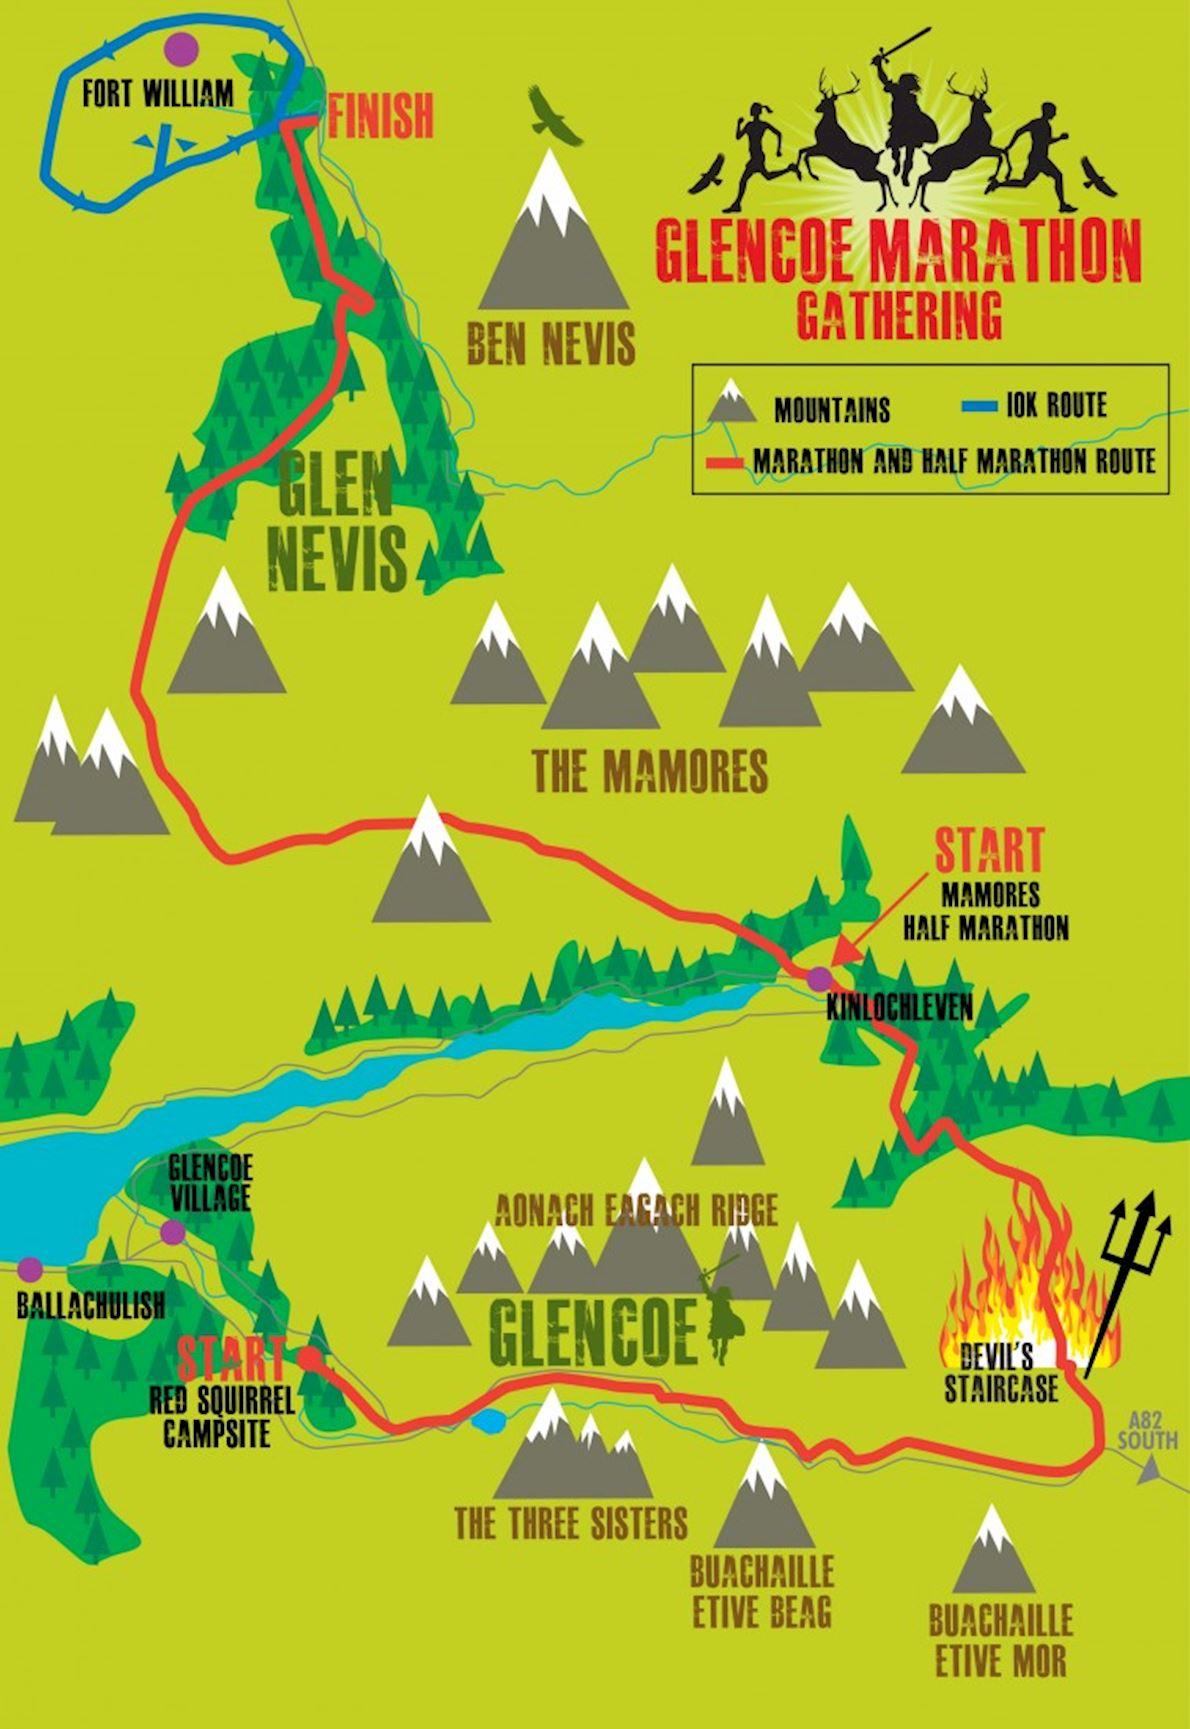 Glencoe Marathon Gathering Routenkarte